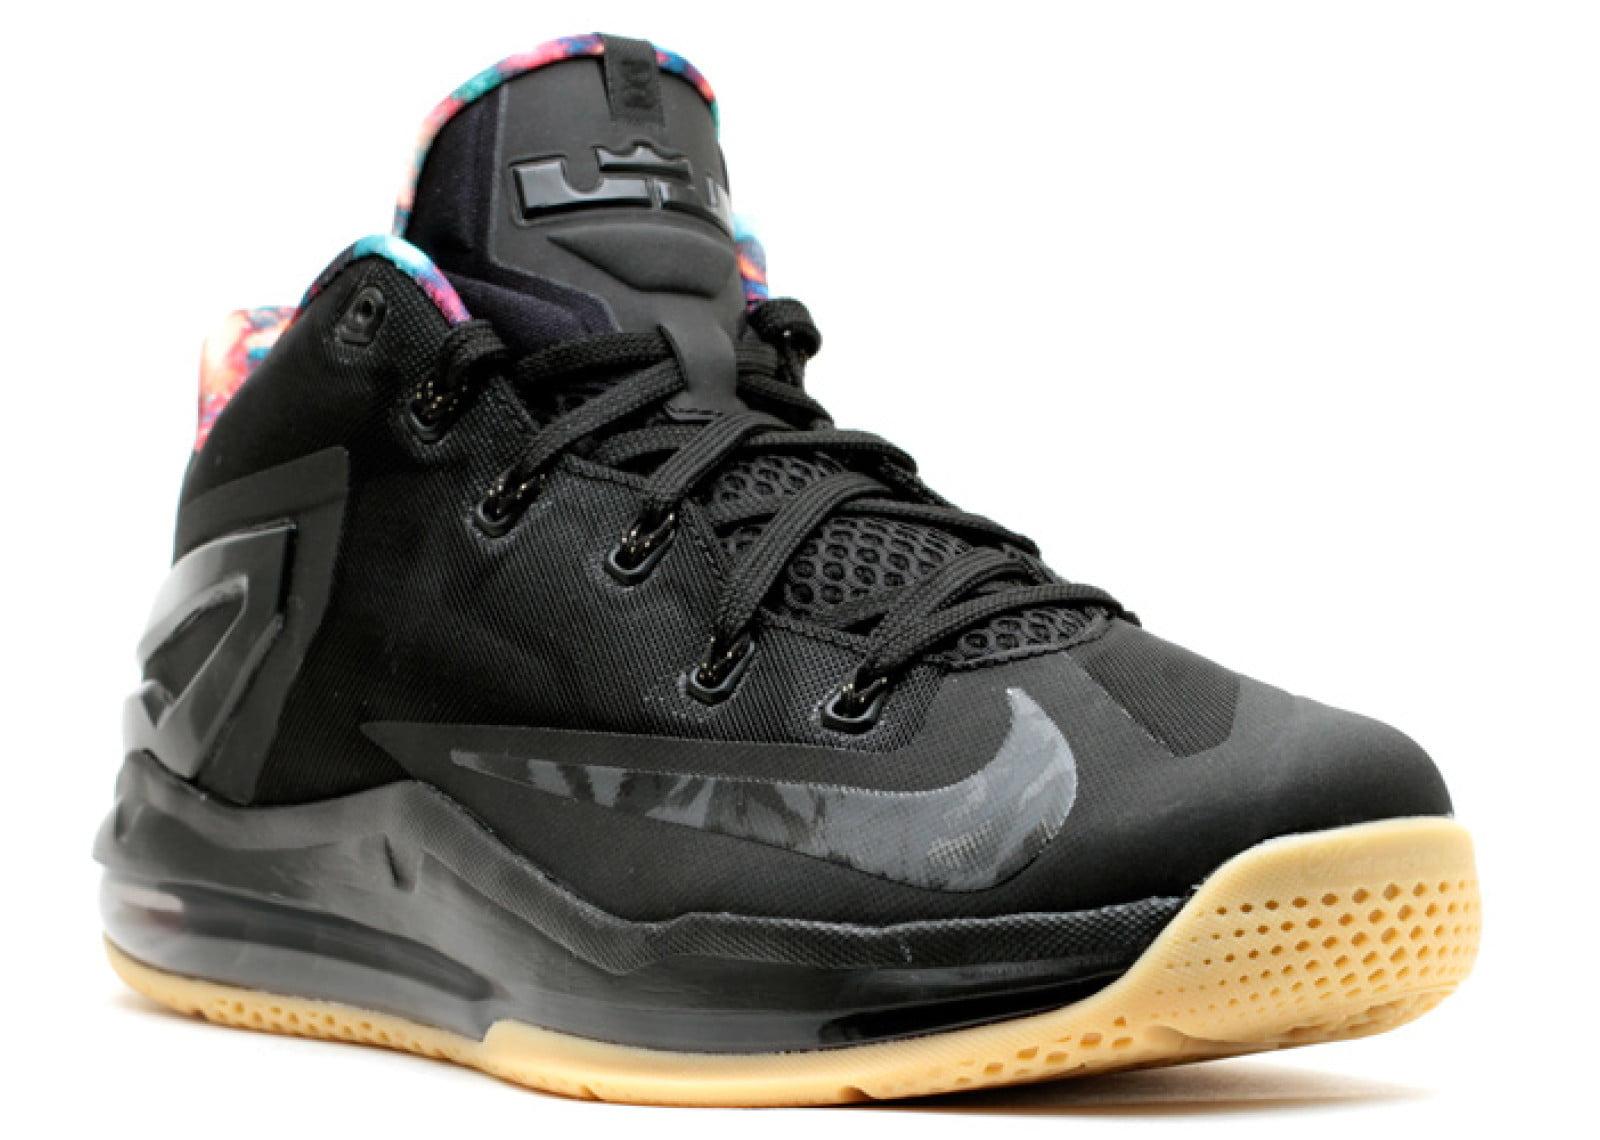 fed36b45130 Nike - Men - Max Lebron 11 Low  Gum  - 642849-078 - Size 13